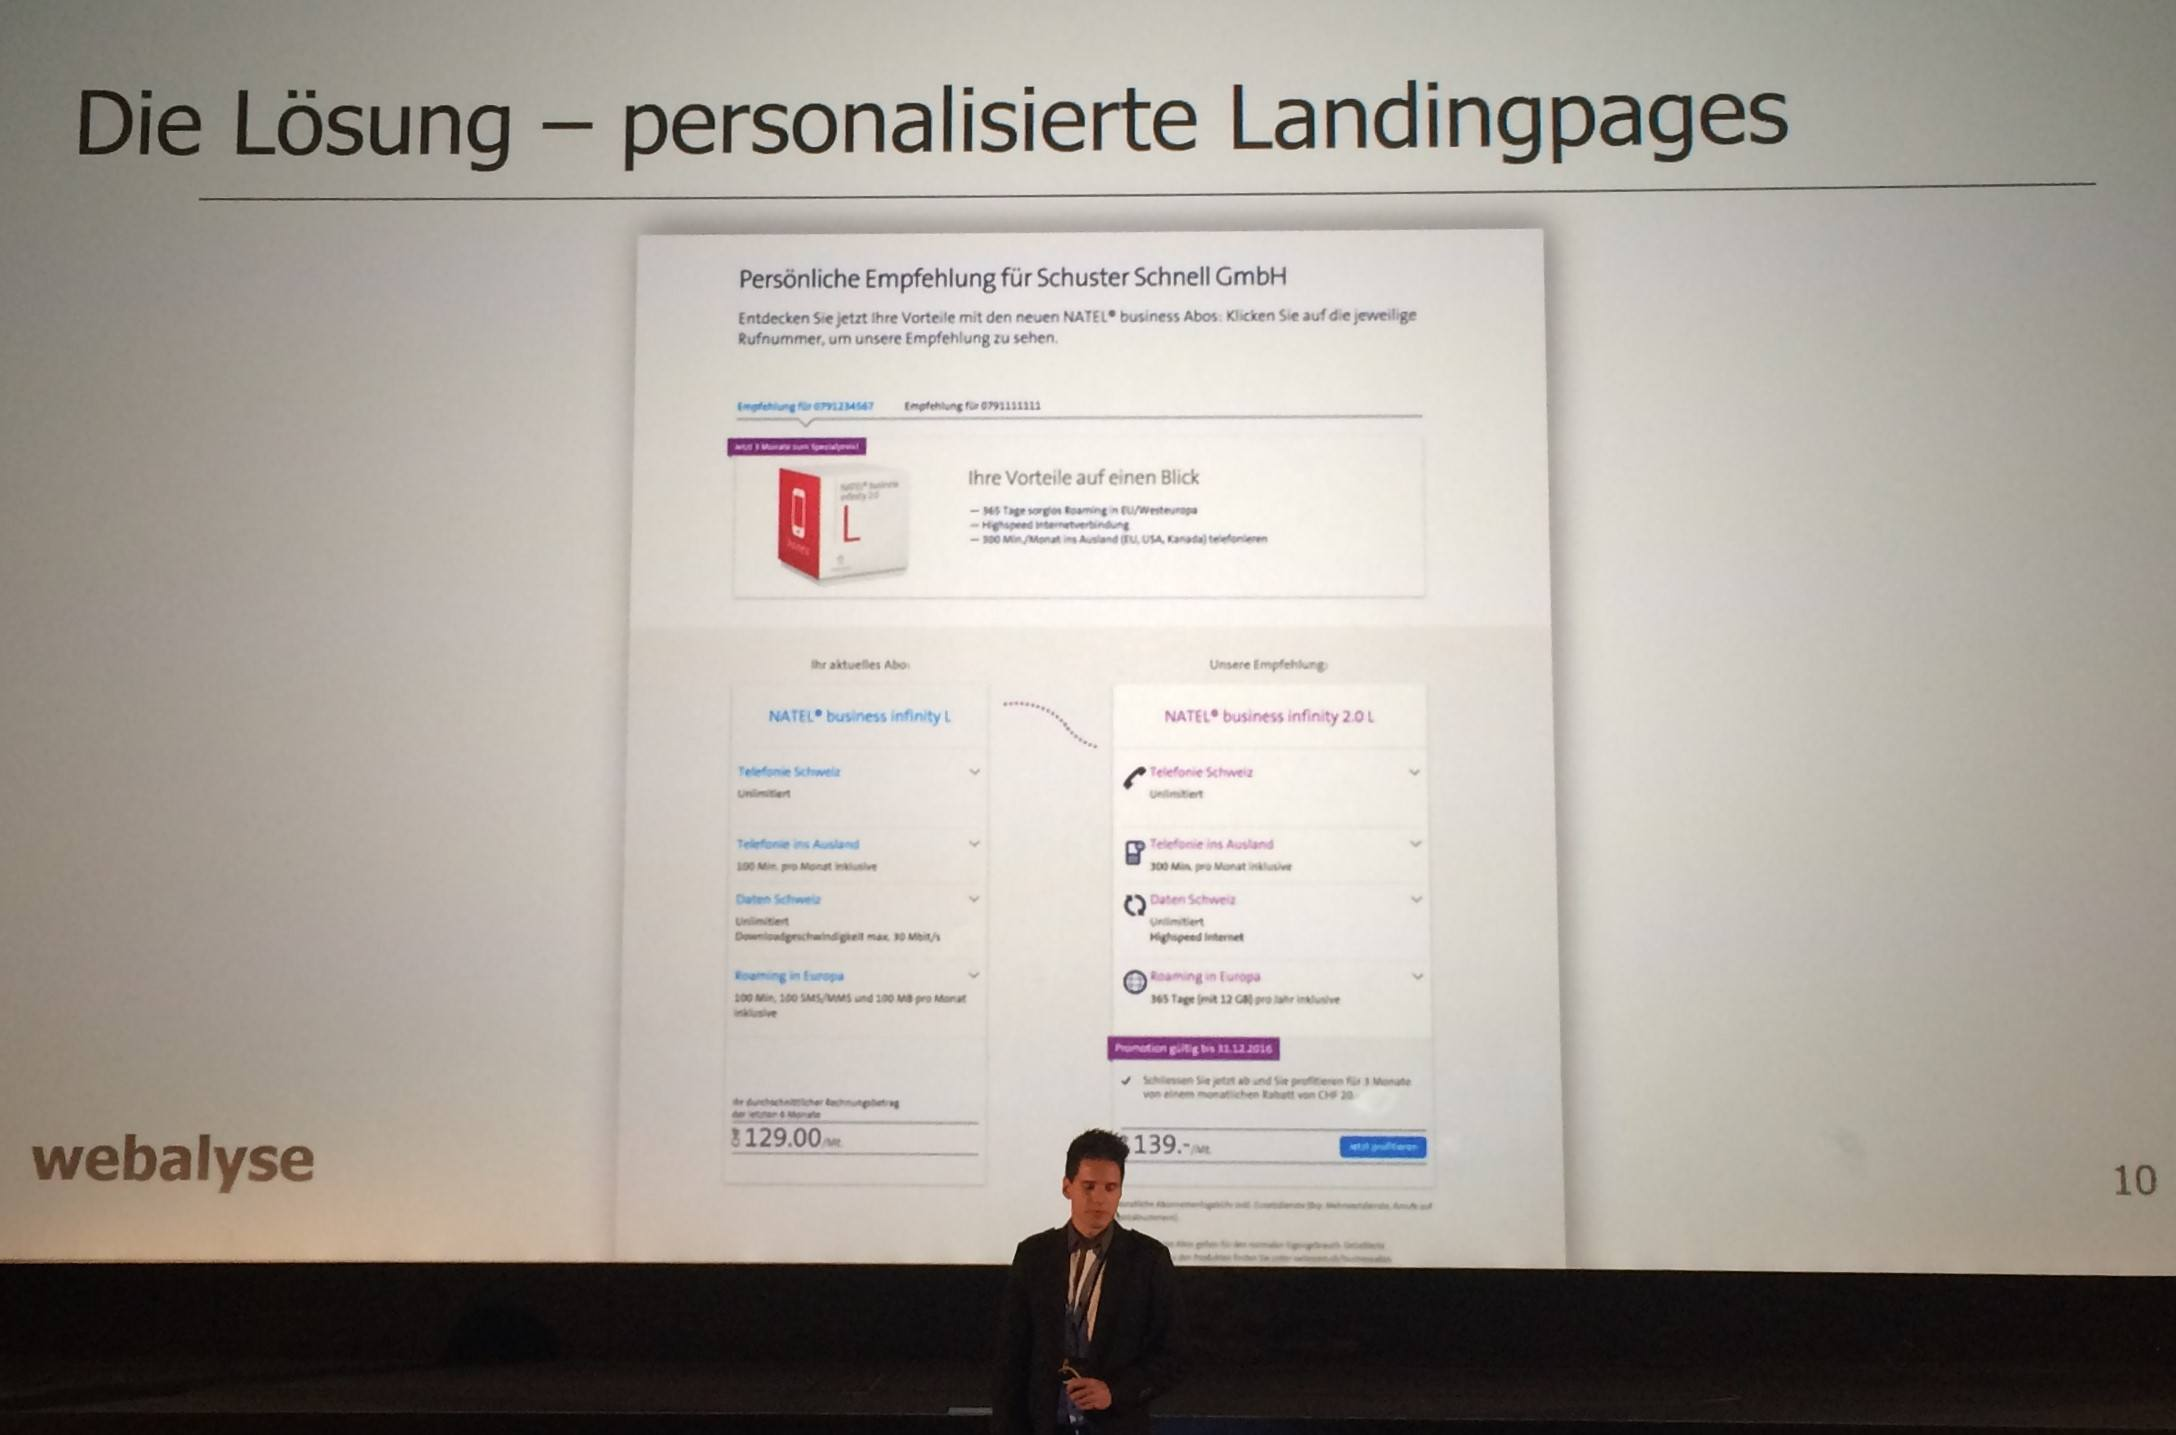 Erhöhte Konversionsraten dank personalisierten Landing-Pages